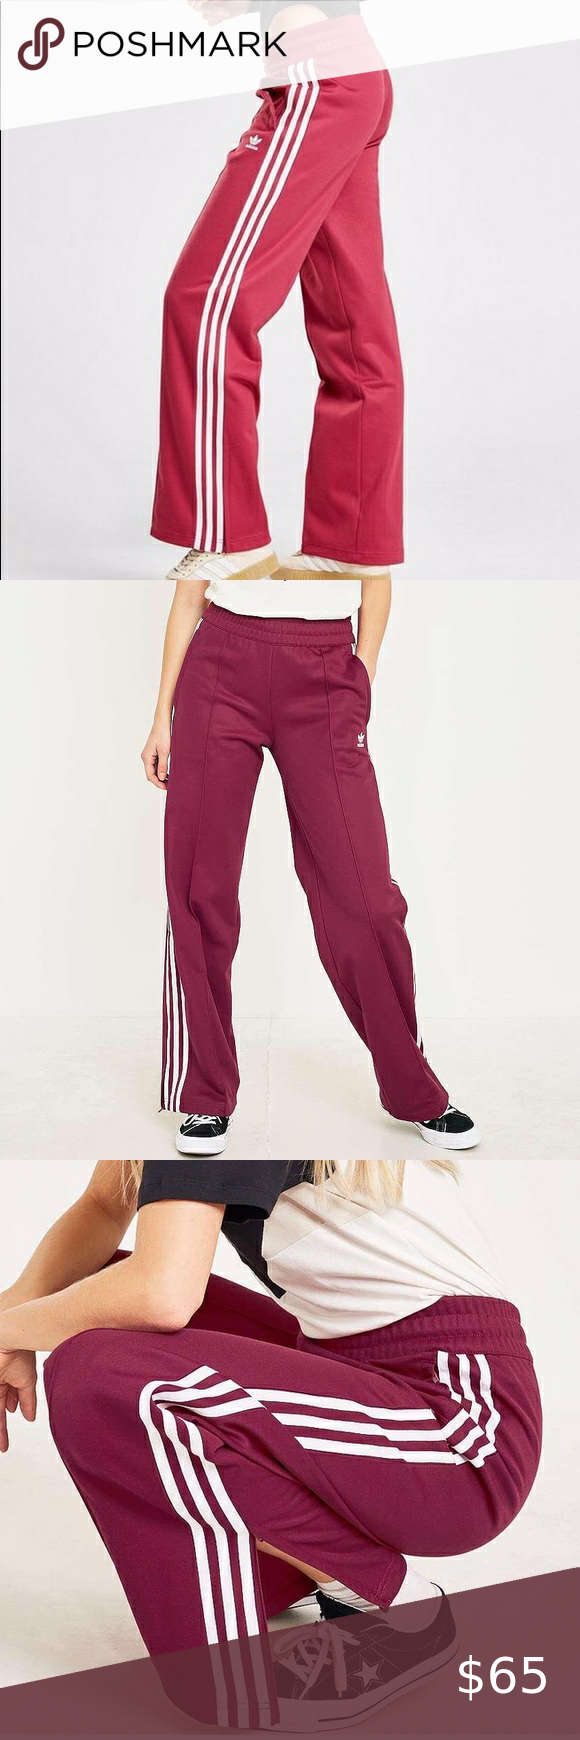 Adidas Ruby colored NWT contemporary